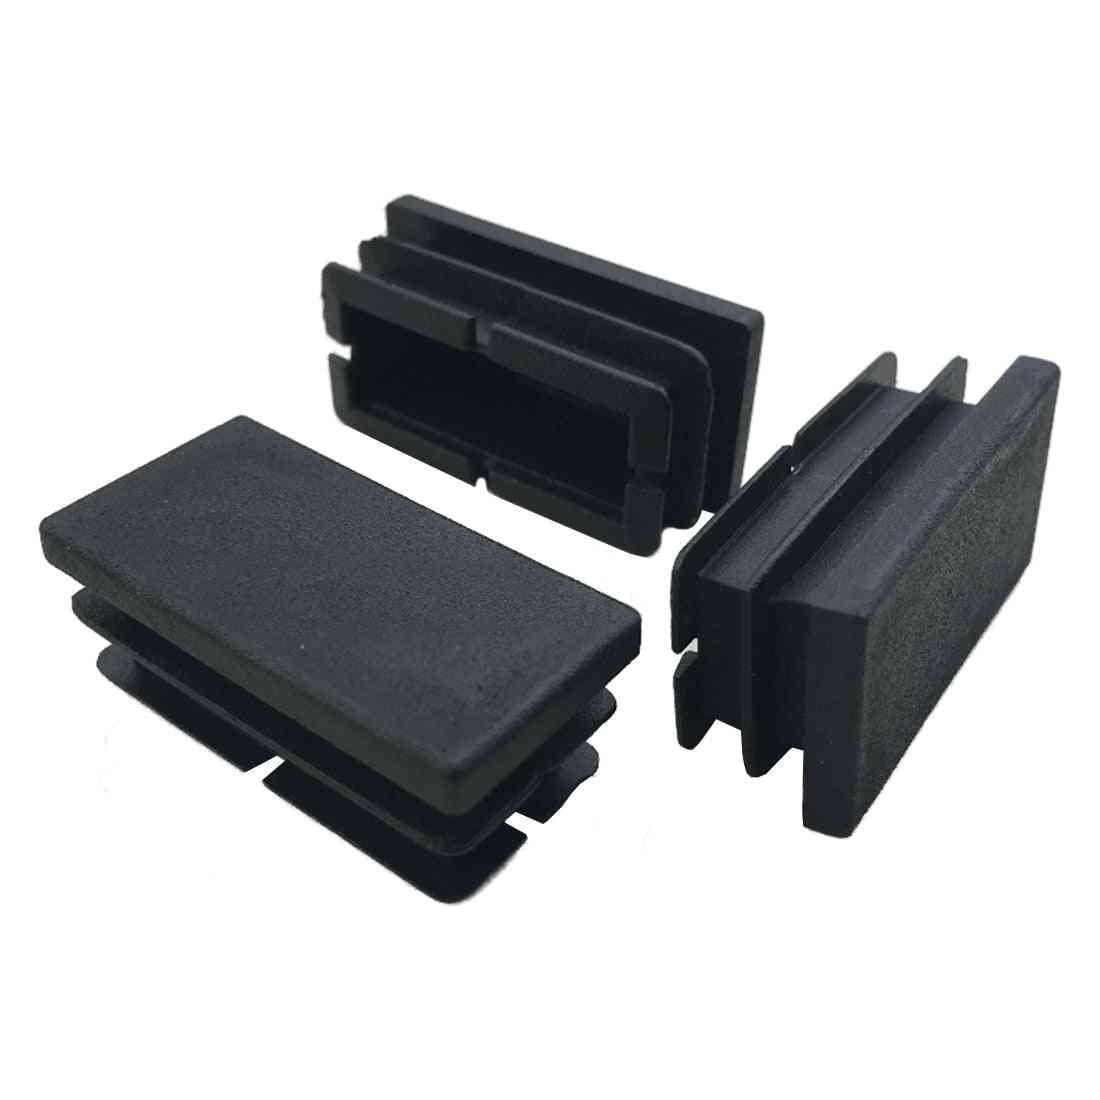 8 Pcs Black Plastic Rectangular Blanking End Caps